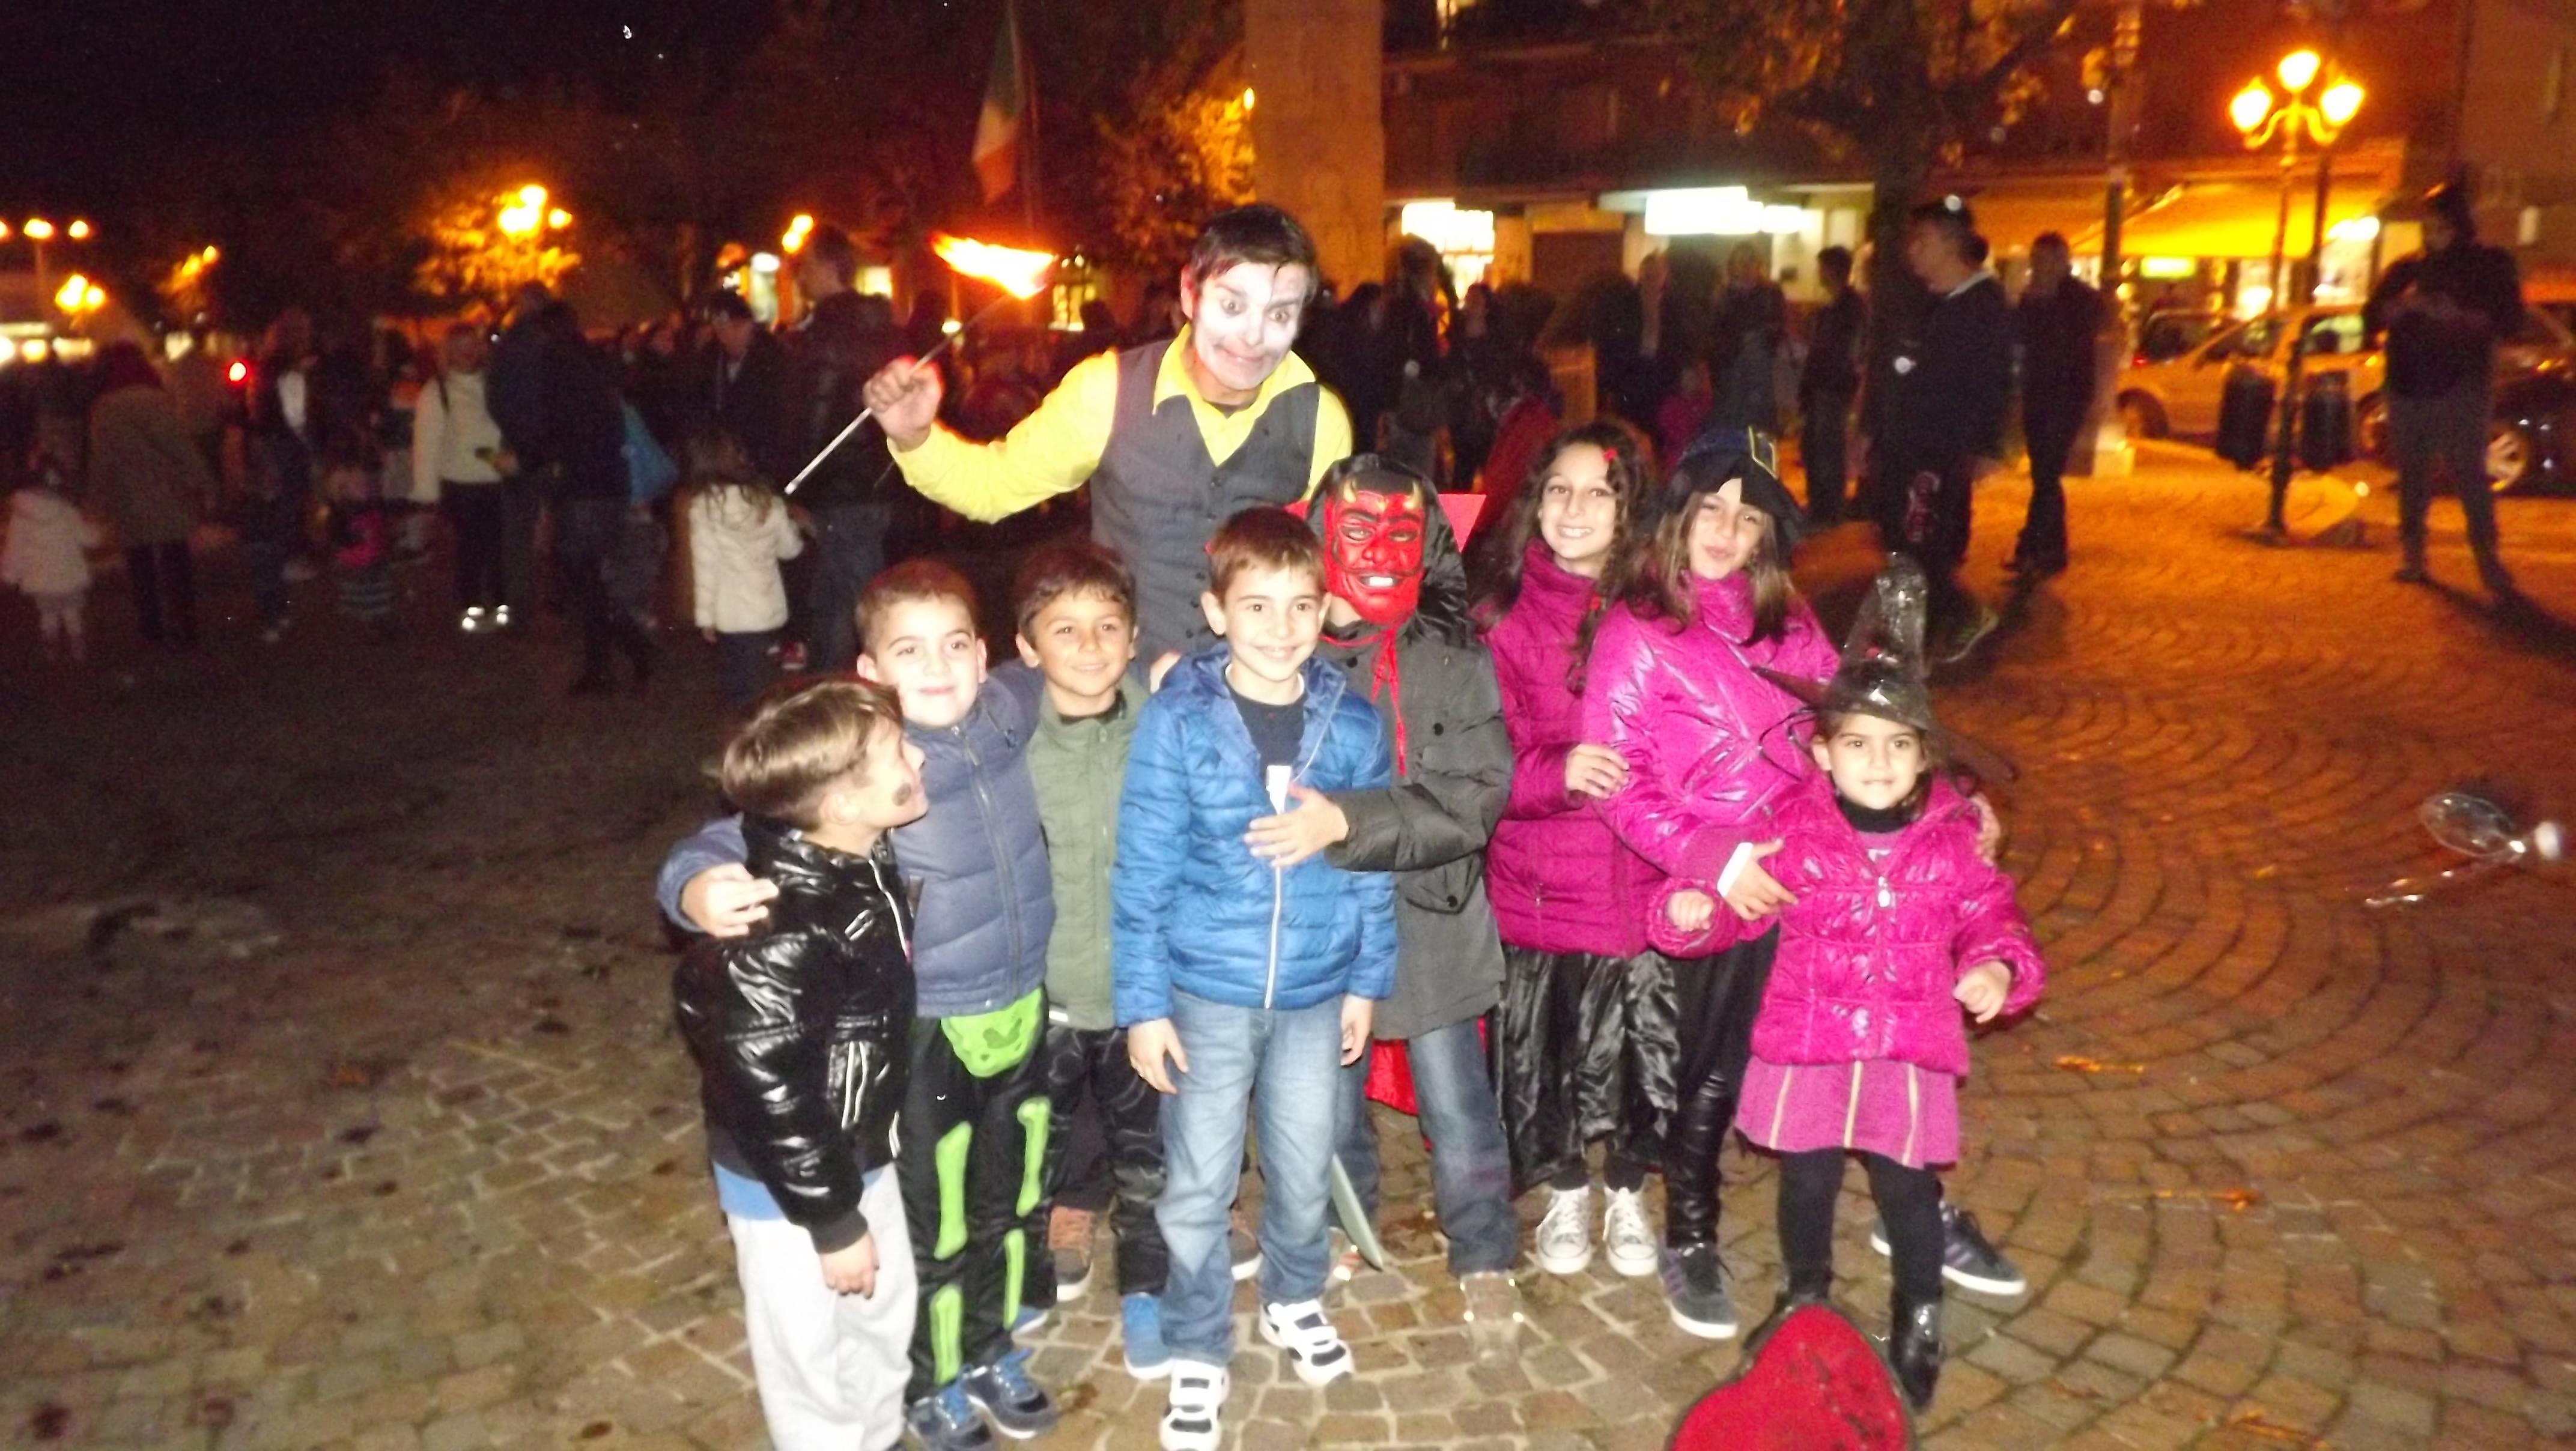 Halloween Gruppo.Halloween In Piazza Santa Eurosia Foto Di Gruppo Bambini